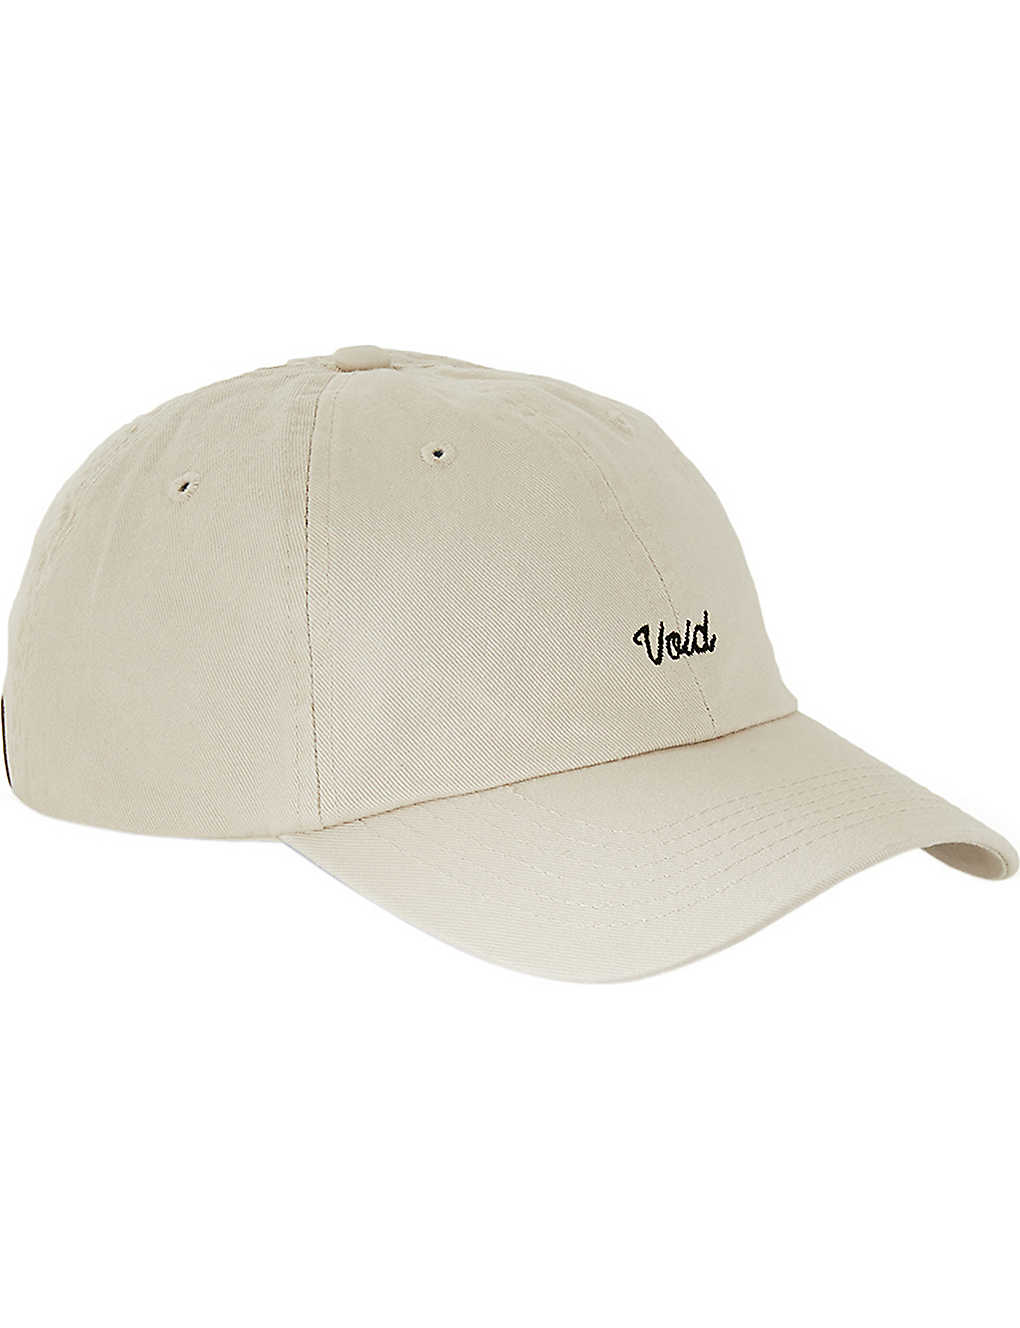 a65ef61e697 TOPMAN - Void strapback cap